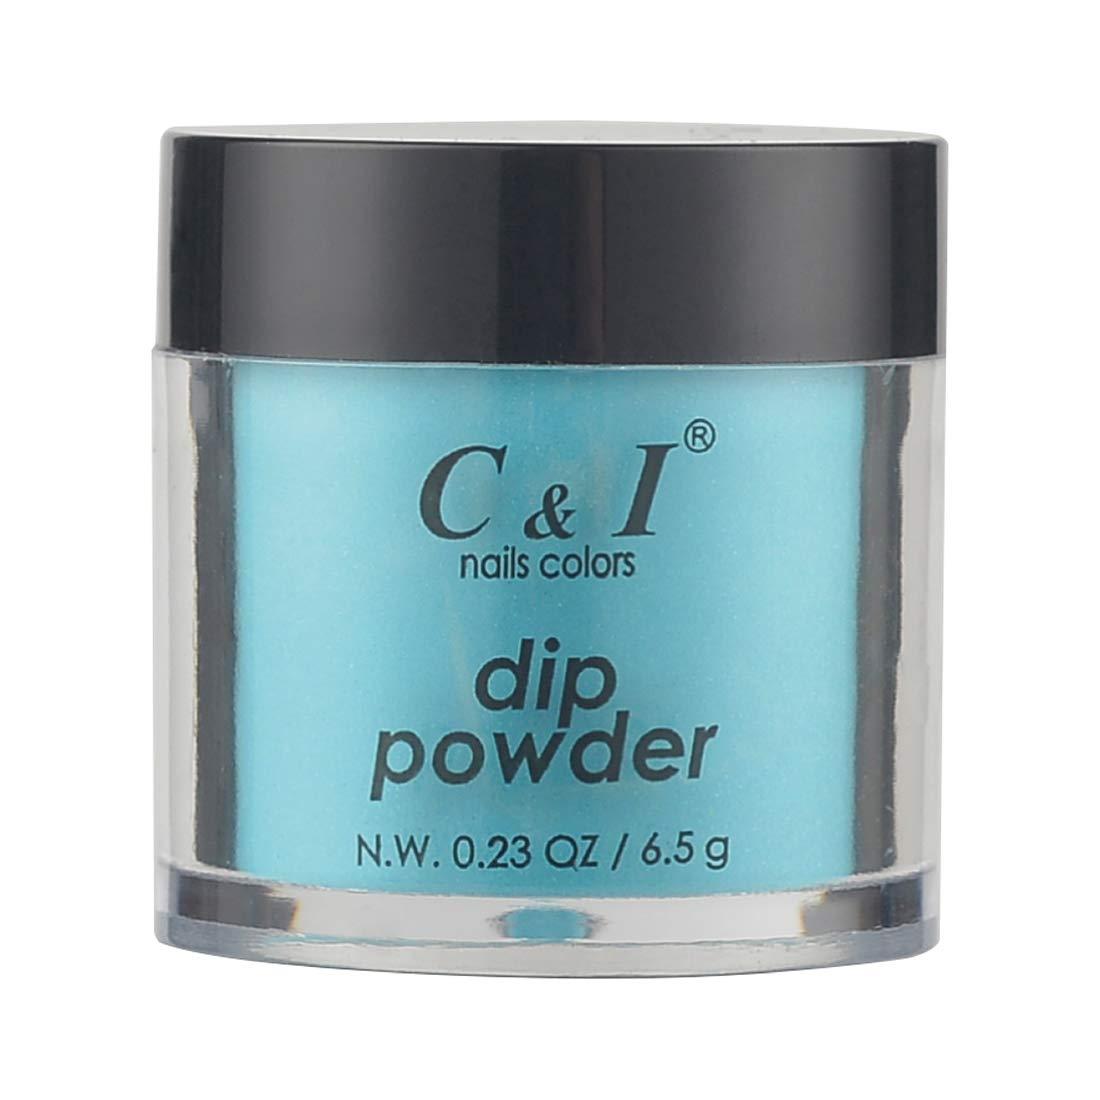 C & I Dipping Powder, Nail Colors, Gel Effect, Color # 71 Cyan Glaze, 0.23 oz, 6.5 g, Translucent Color System (1 pc)